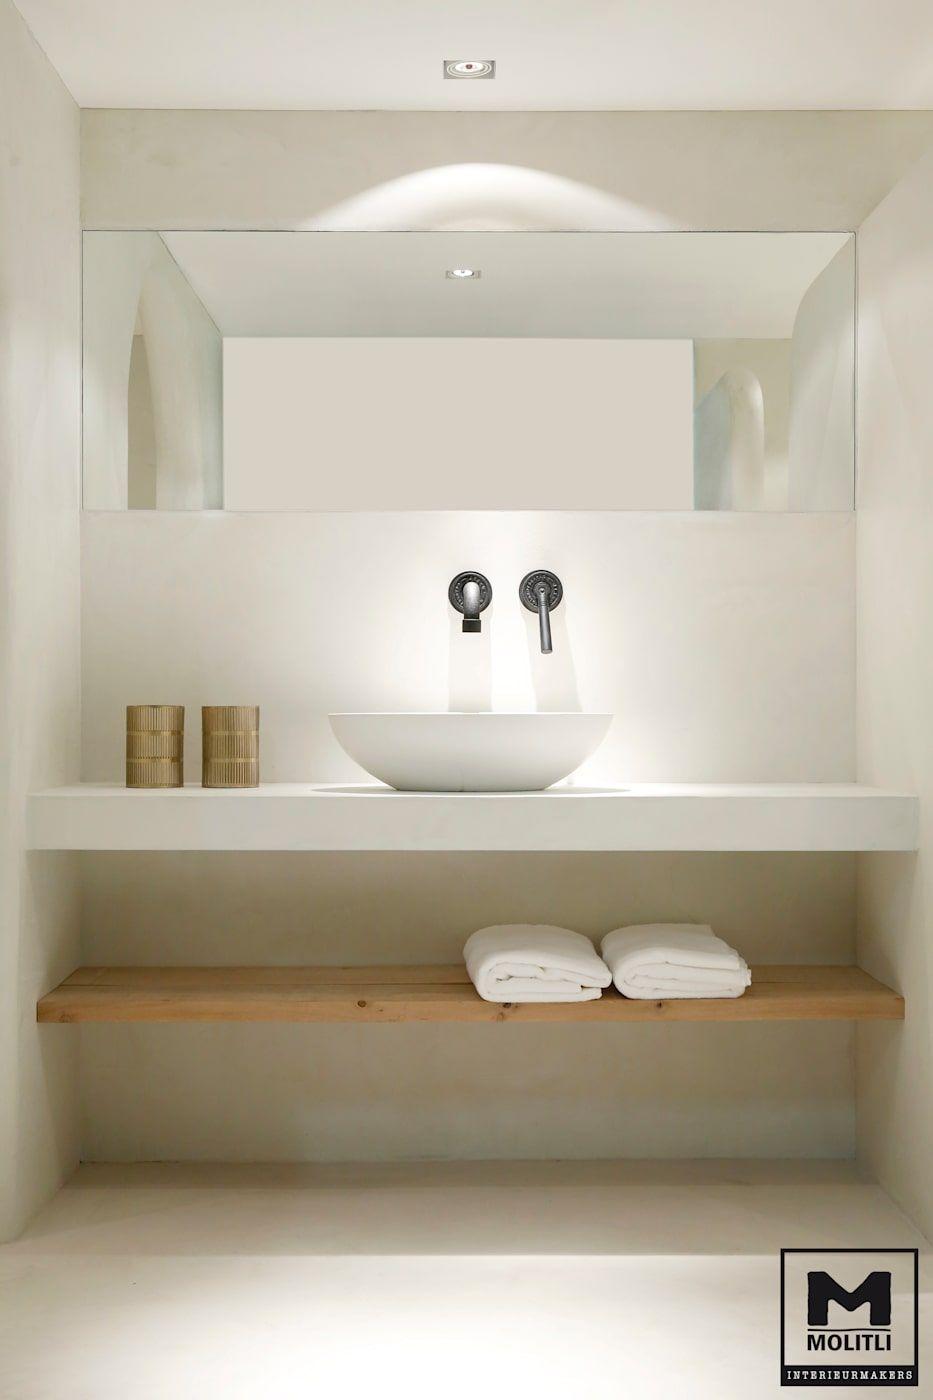 Bohemian badkamer industriële badkamers van molitli interieurmakers industrieel   homify